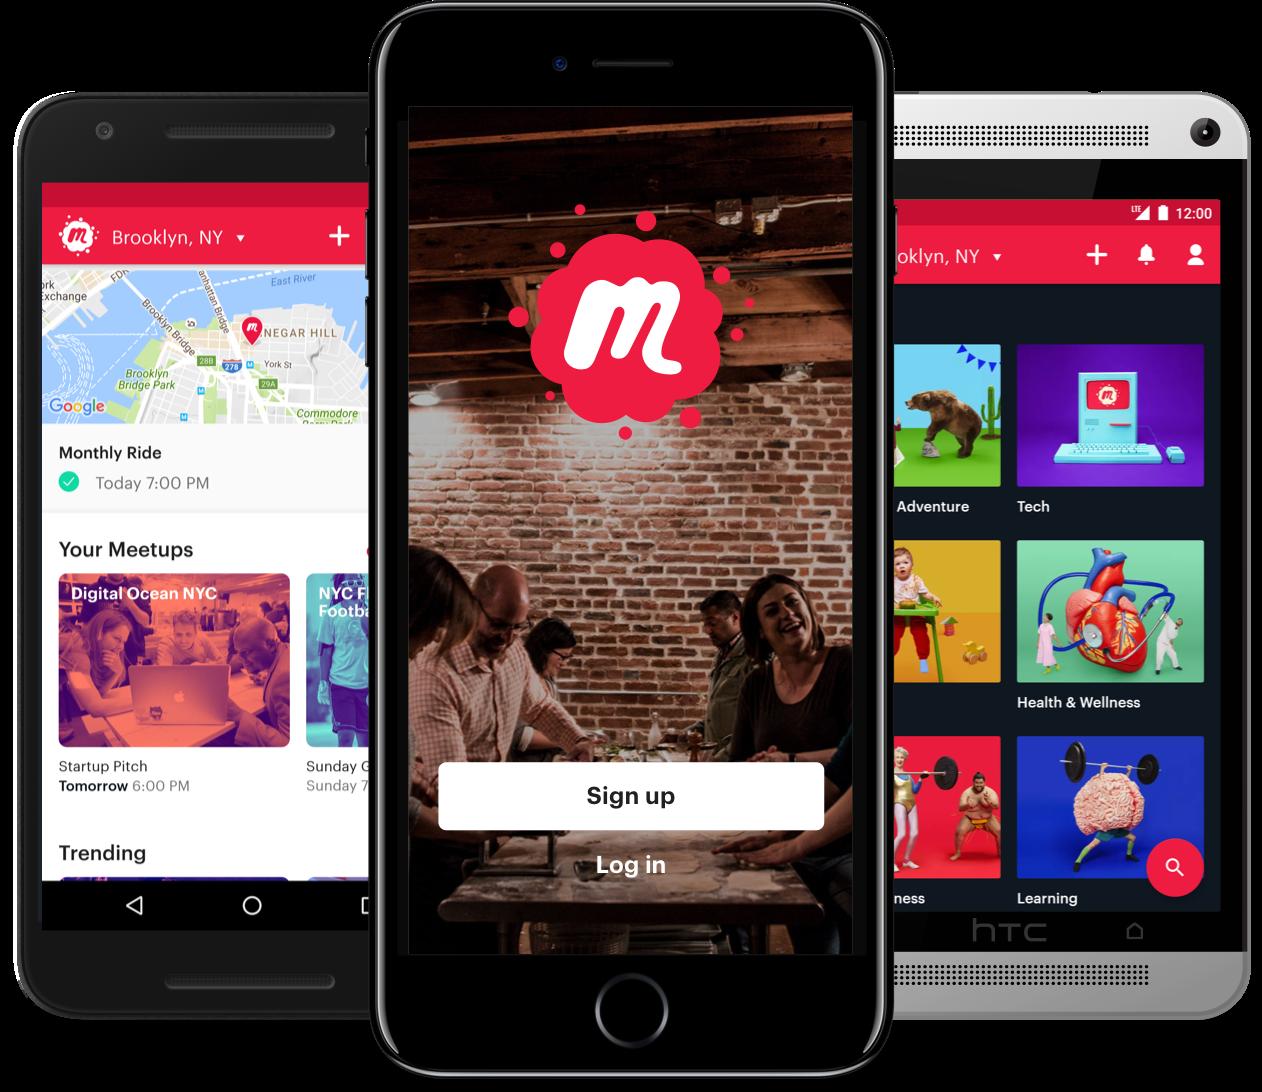 Meetup Rebrand News apps, Digital ocean, Blog